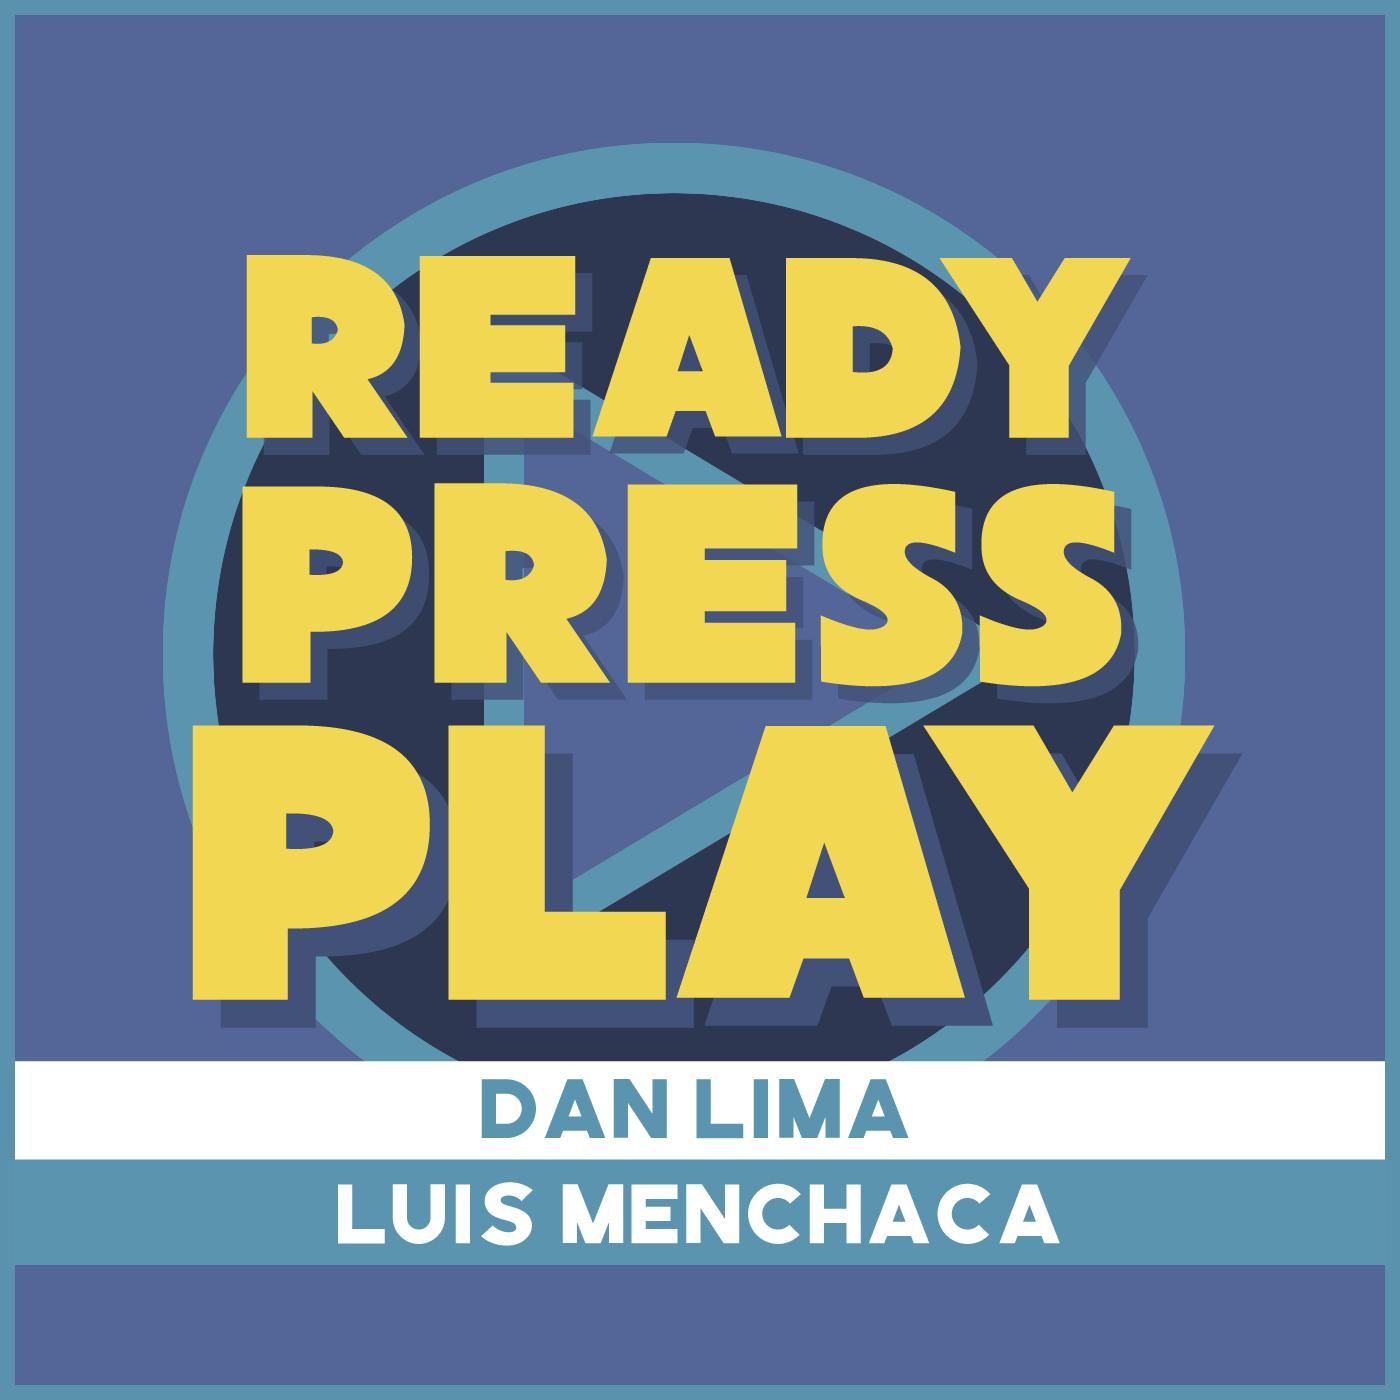 Ready Press Play